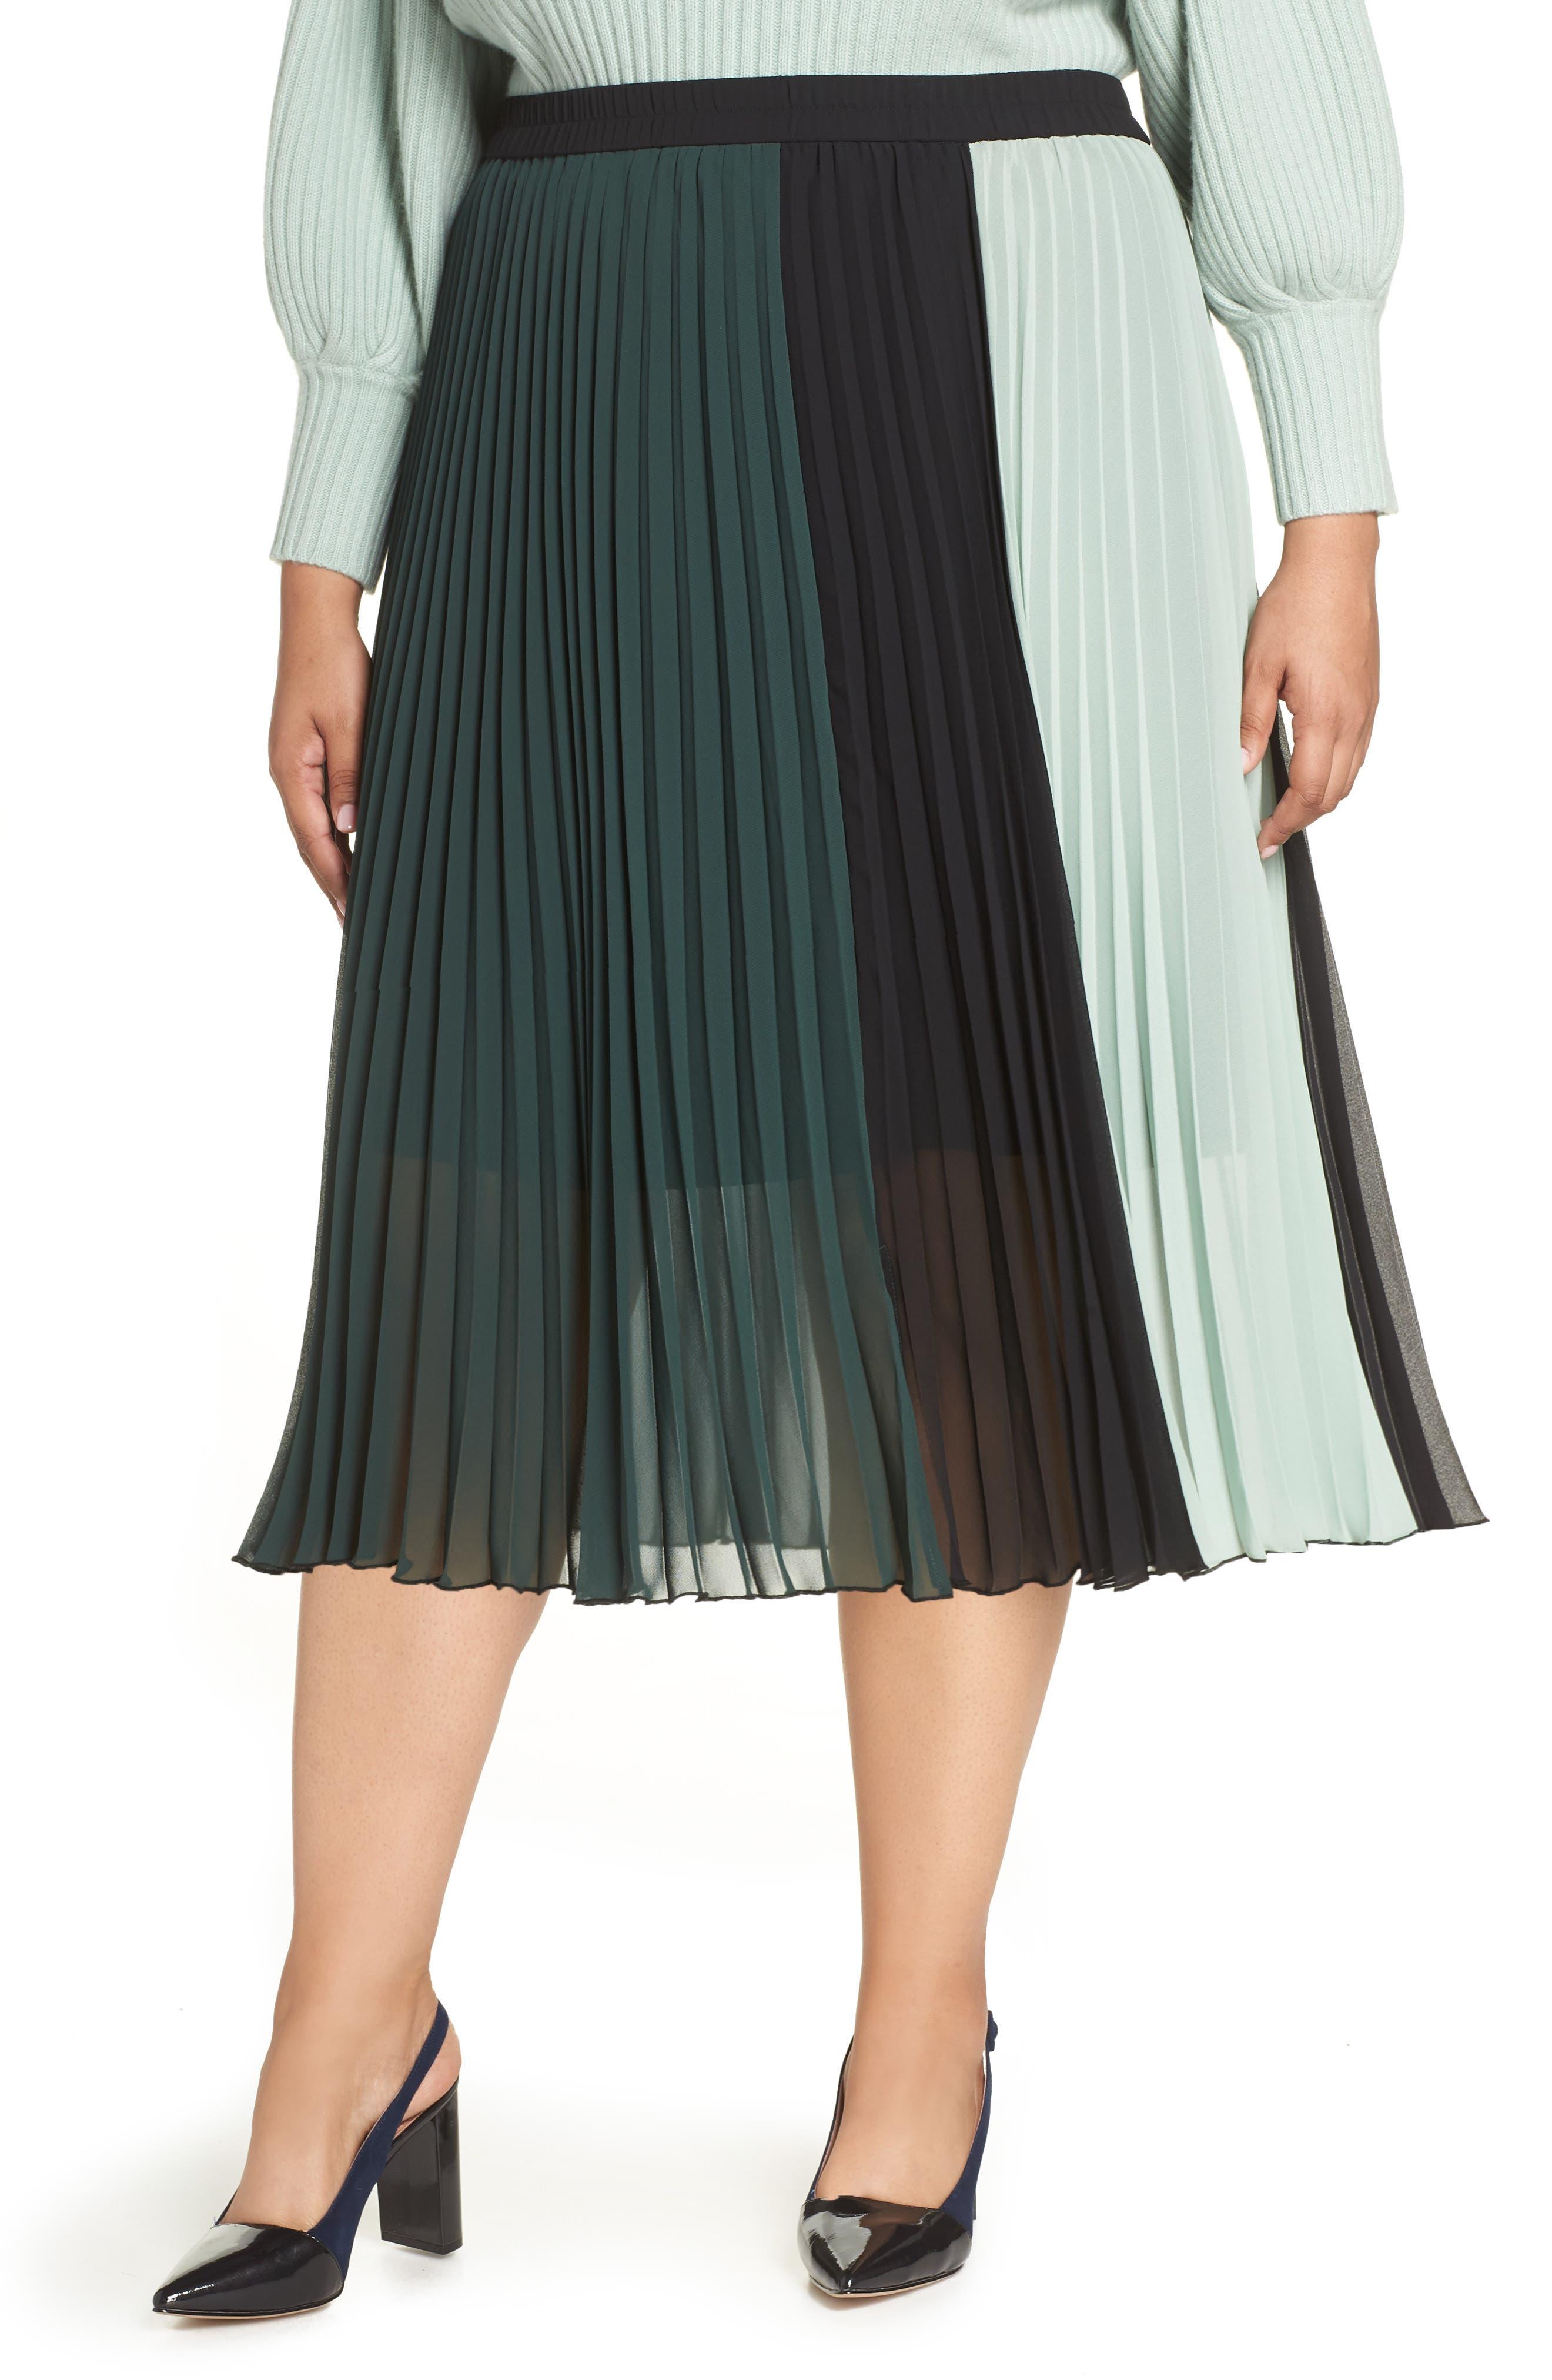 x Atlantic-Pacific Colorblock Pleated Midi Skirt,                         Main,                         color, GREEN- BLACK COLORBLOCK